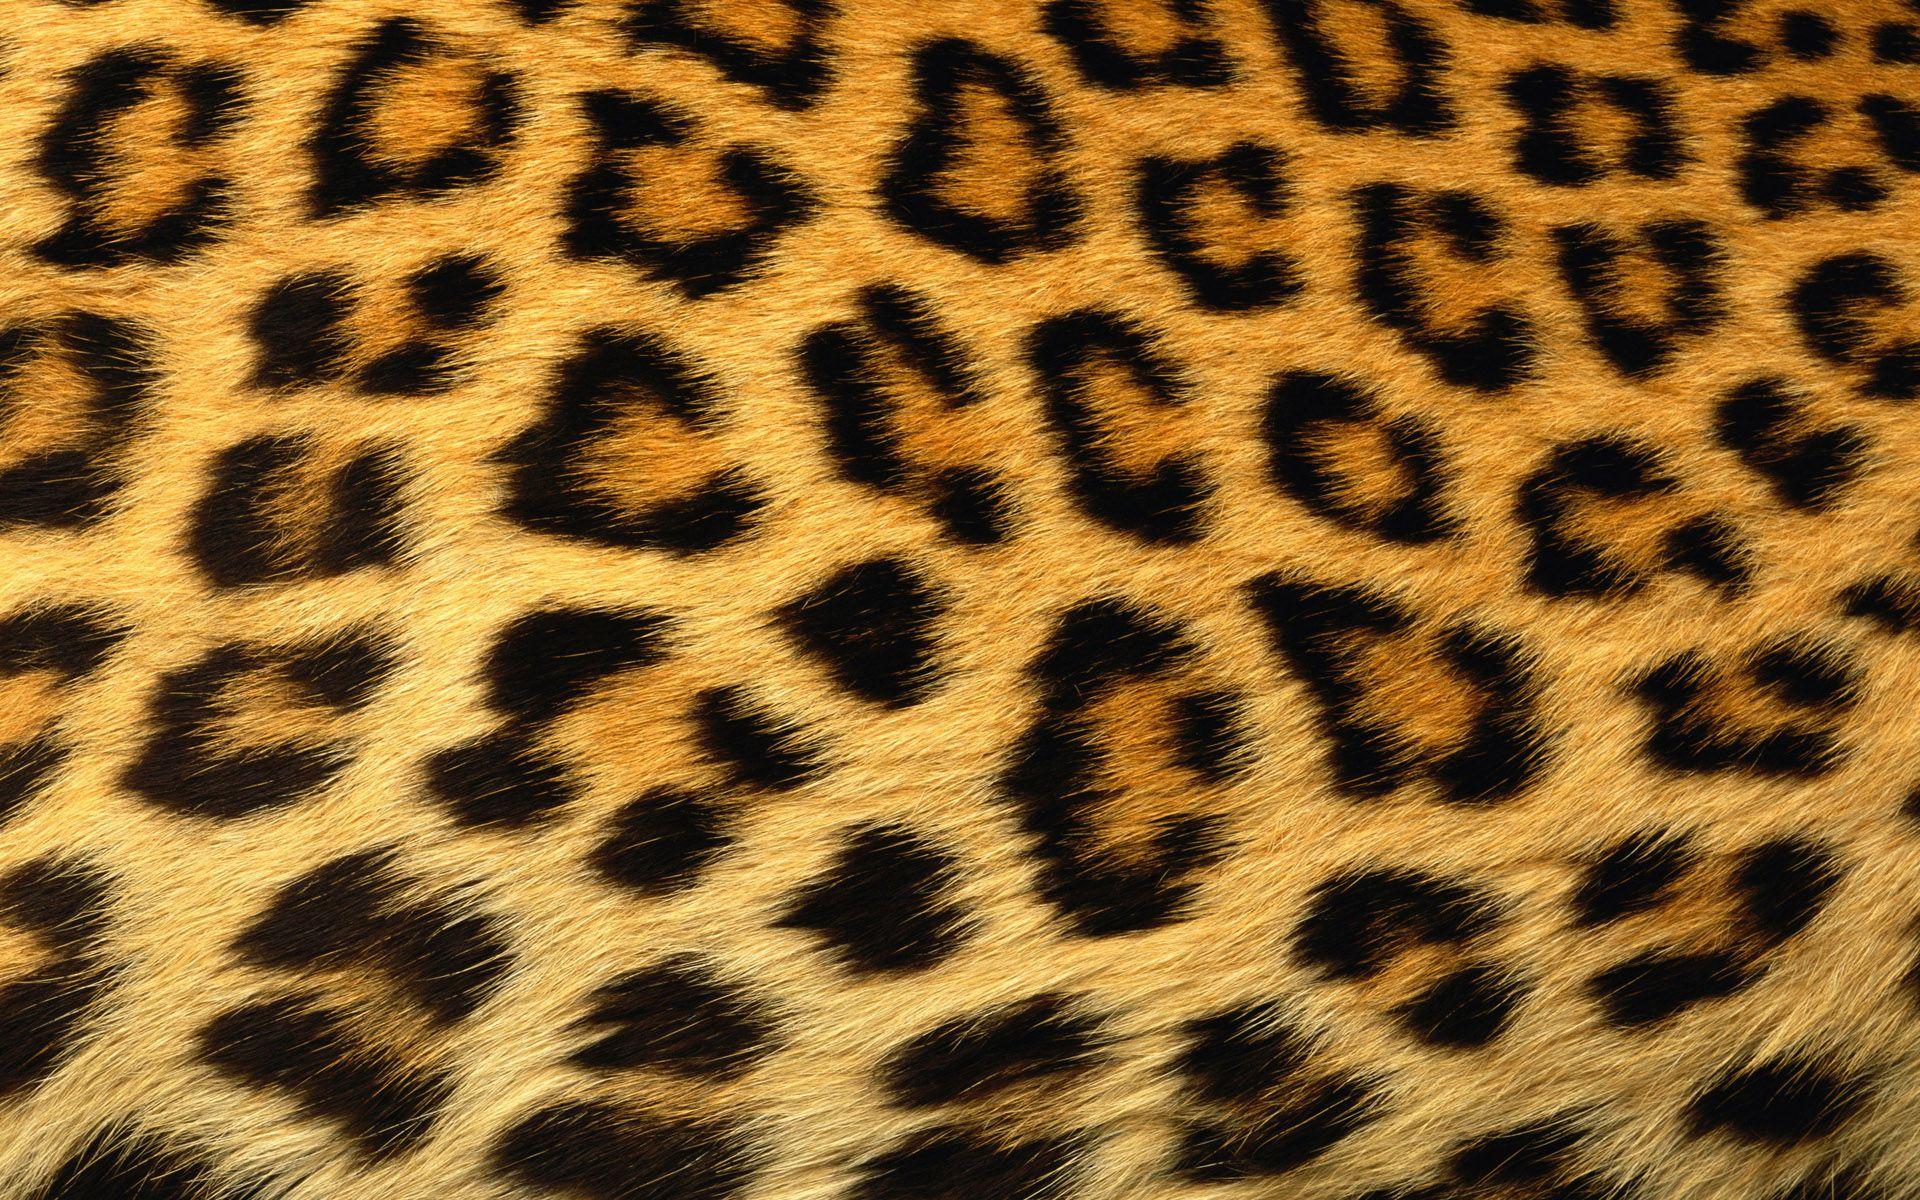 Free Miscellaneous Texture Cheetah Texture Leopard Print Wallpaper Cheetah Print Wallpaper Leopard Print Background